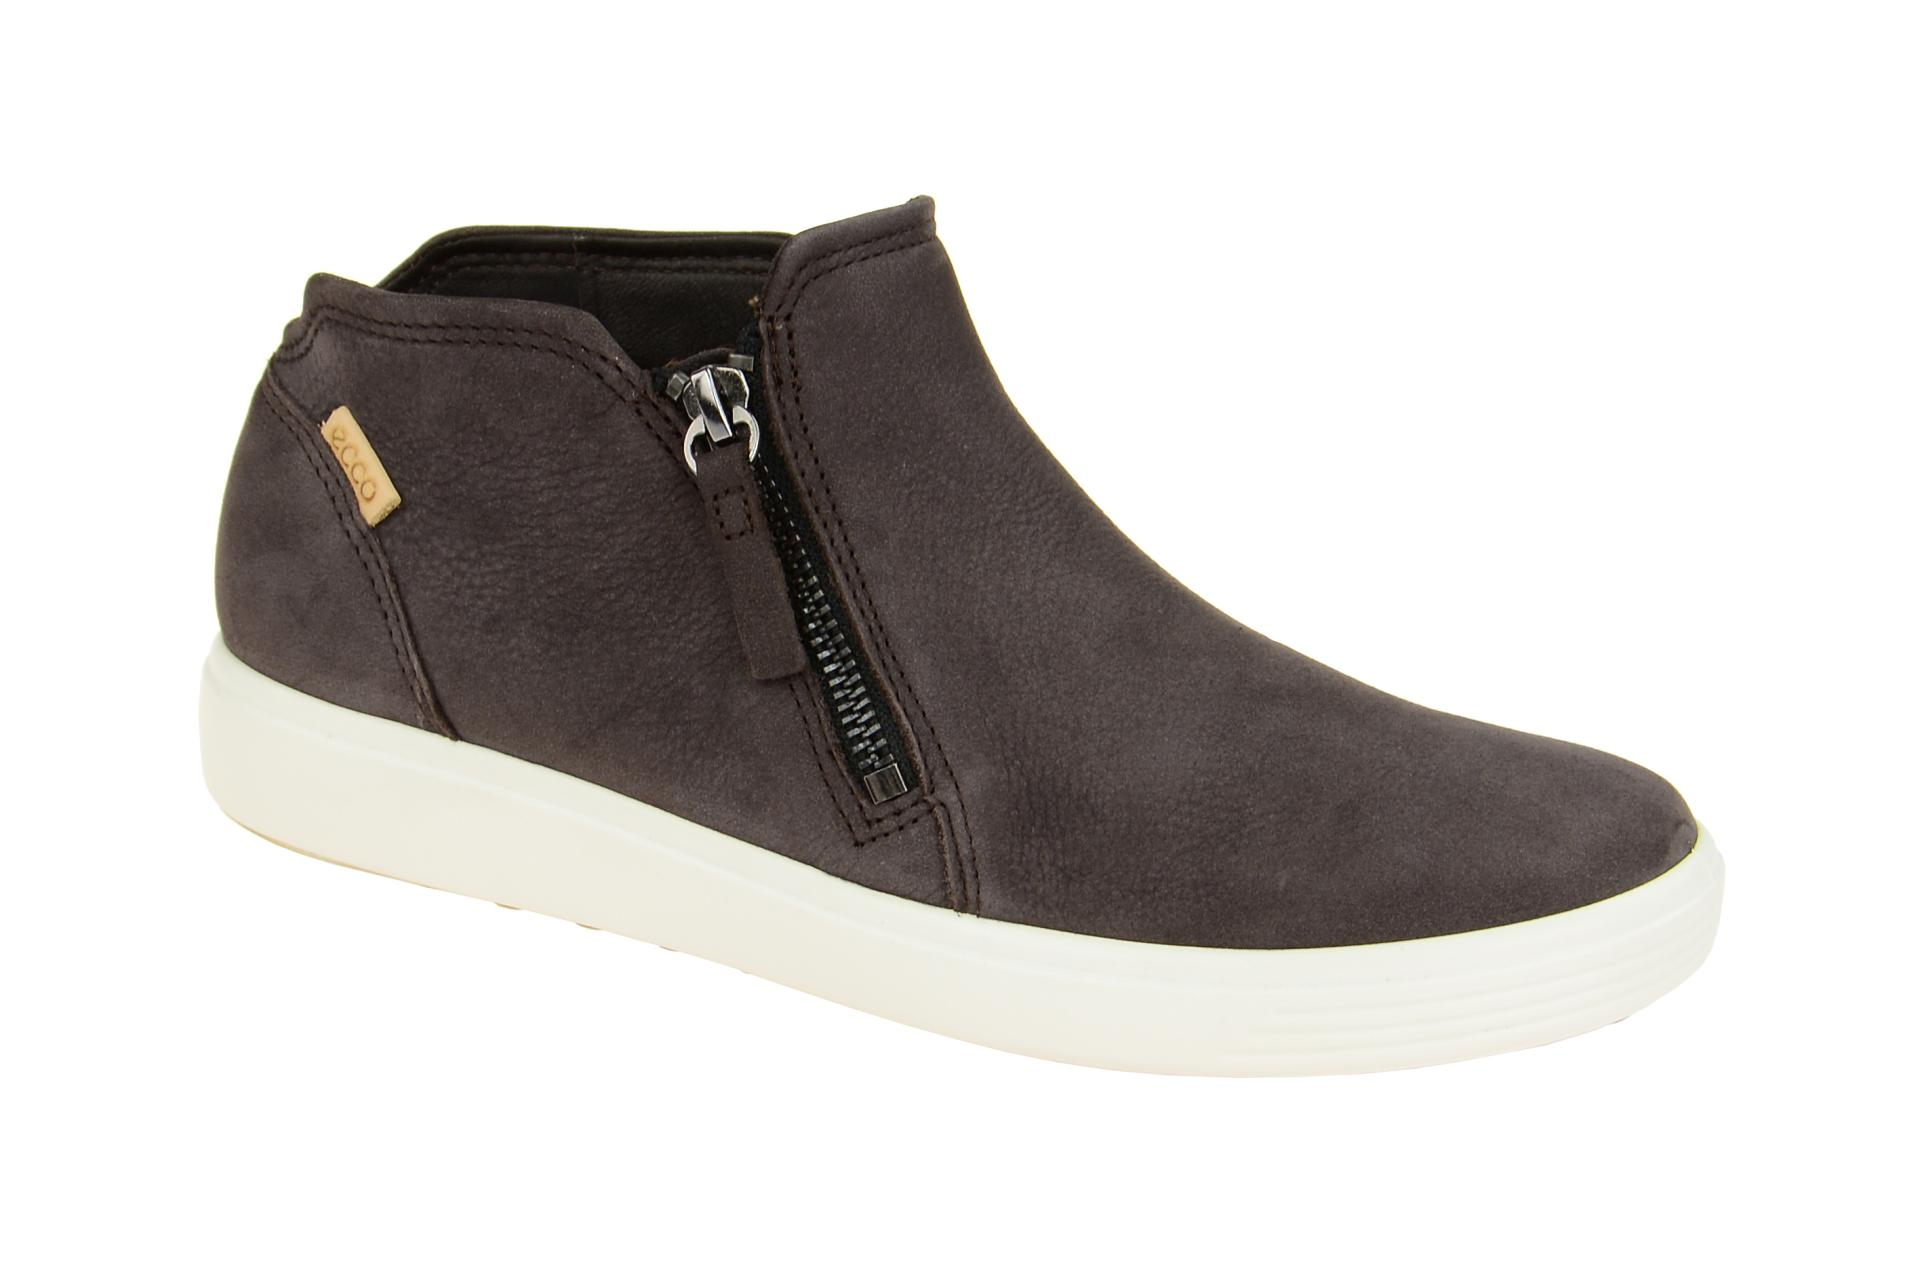 Details about Ecco Schuhe SOFT 7 LADIES braun Damenschuhe bequeme Slipper 43024350668 NEU